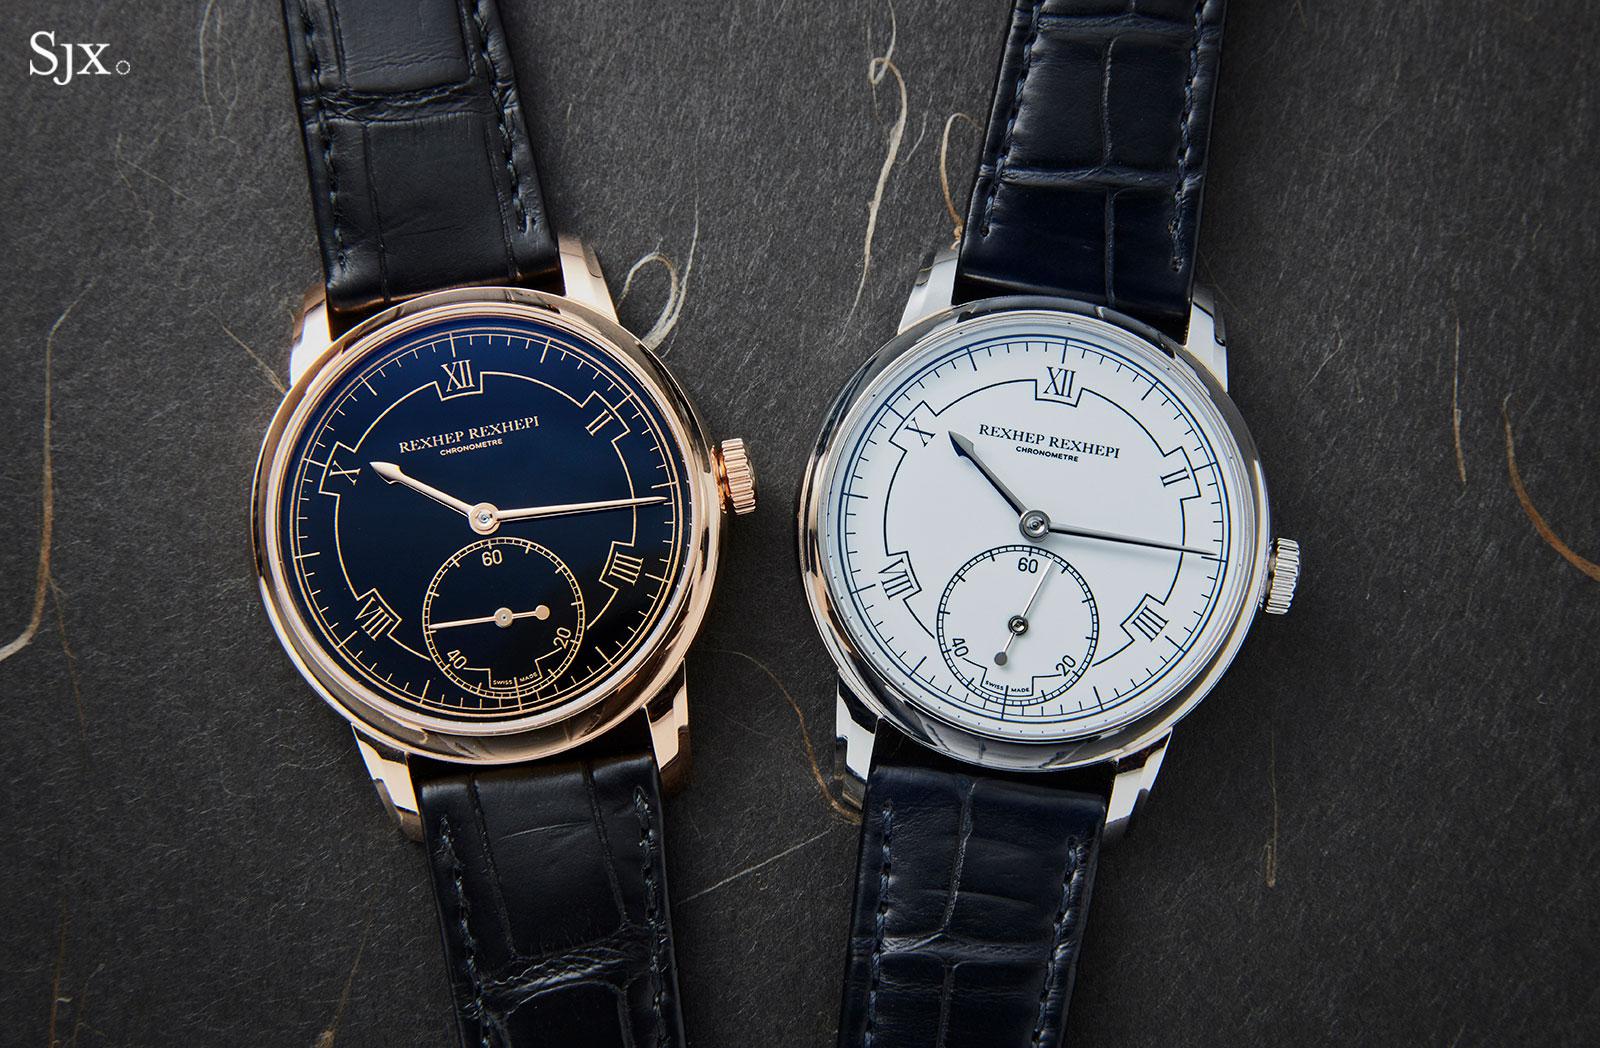 Akrivia Chronometre Contemporain Rexhep Rexhepi 5